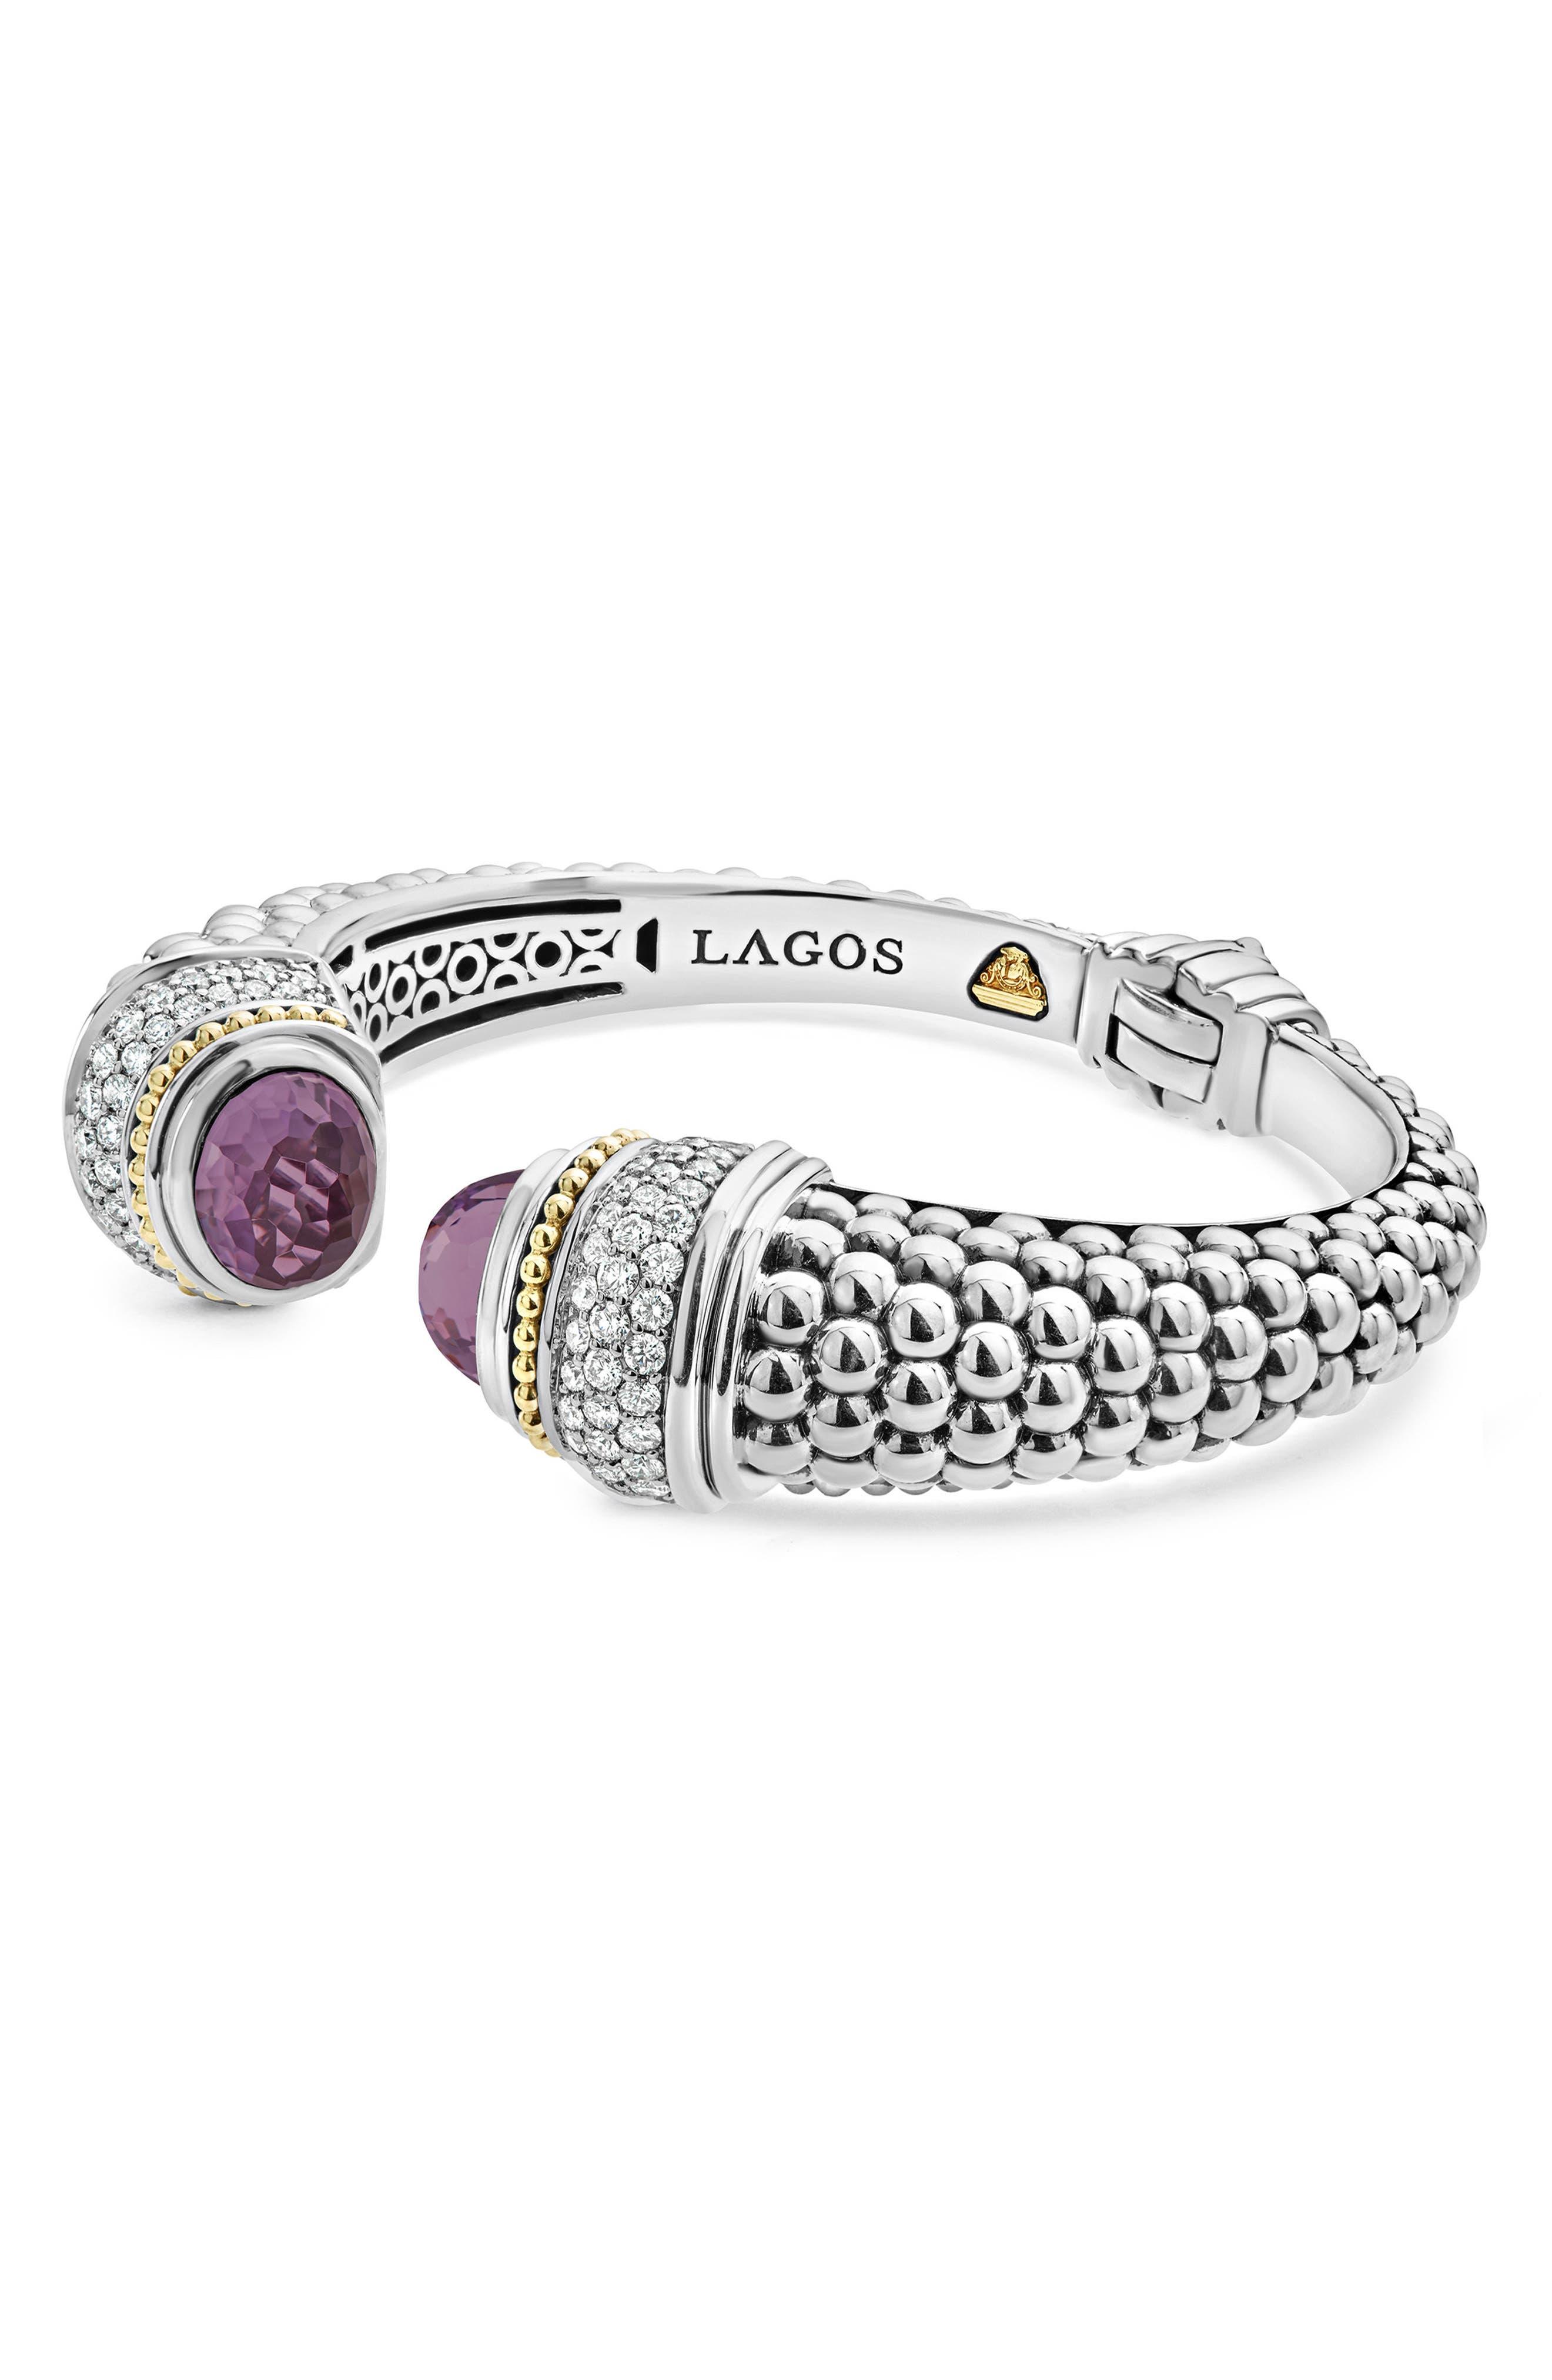 Caviar Diamond & Semiprecious Stone Wrist Cuff,                         Main,                         color, Amethyst